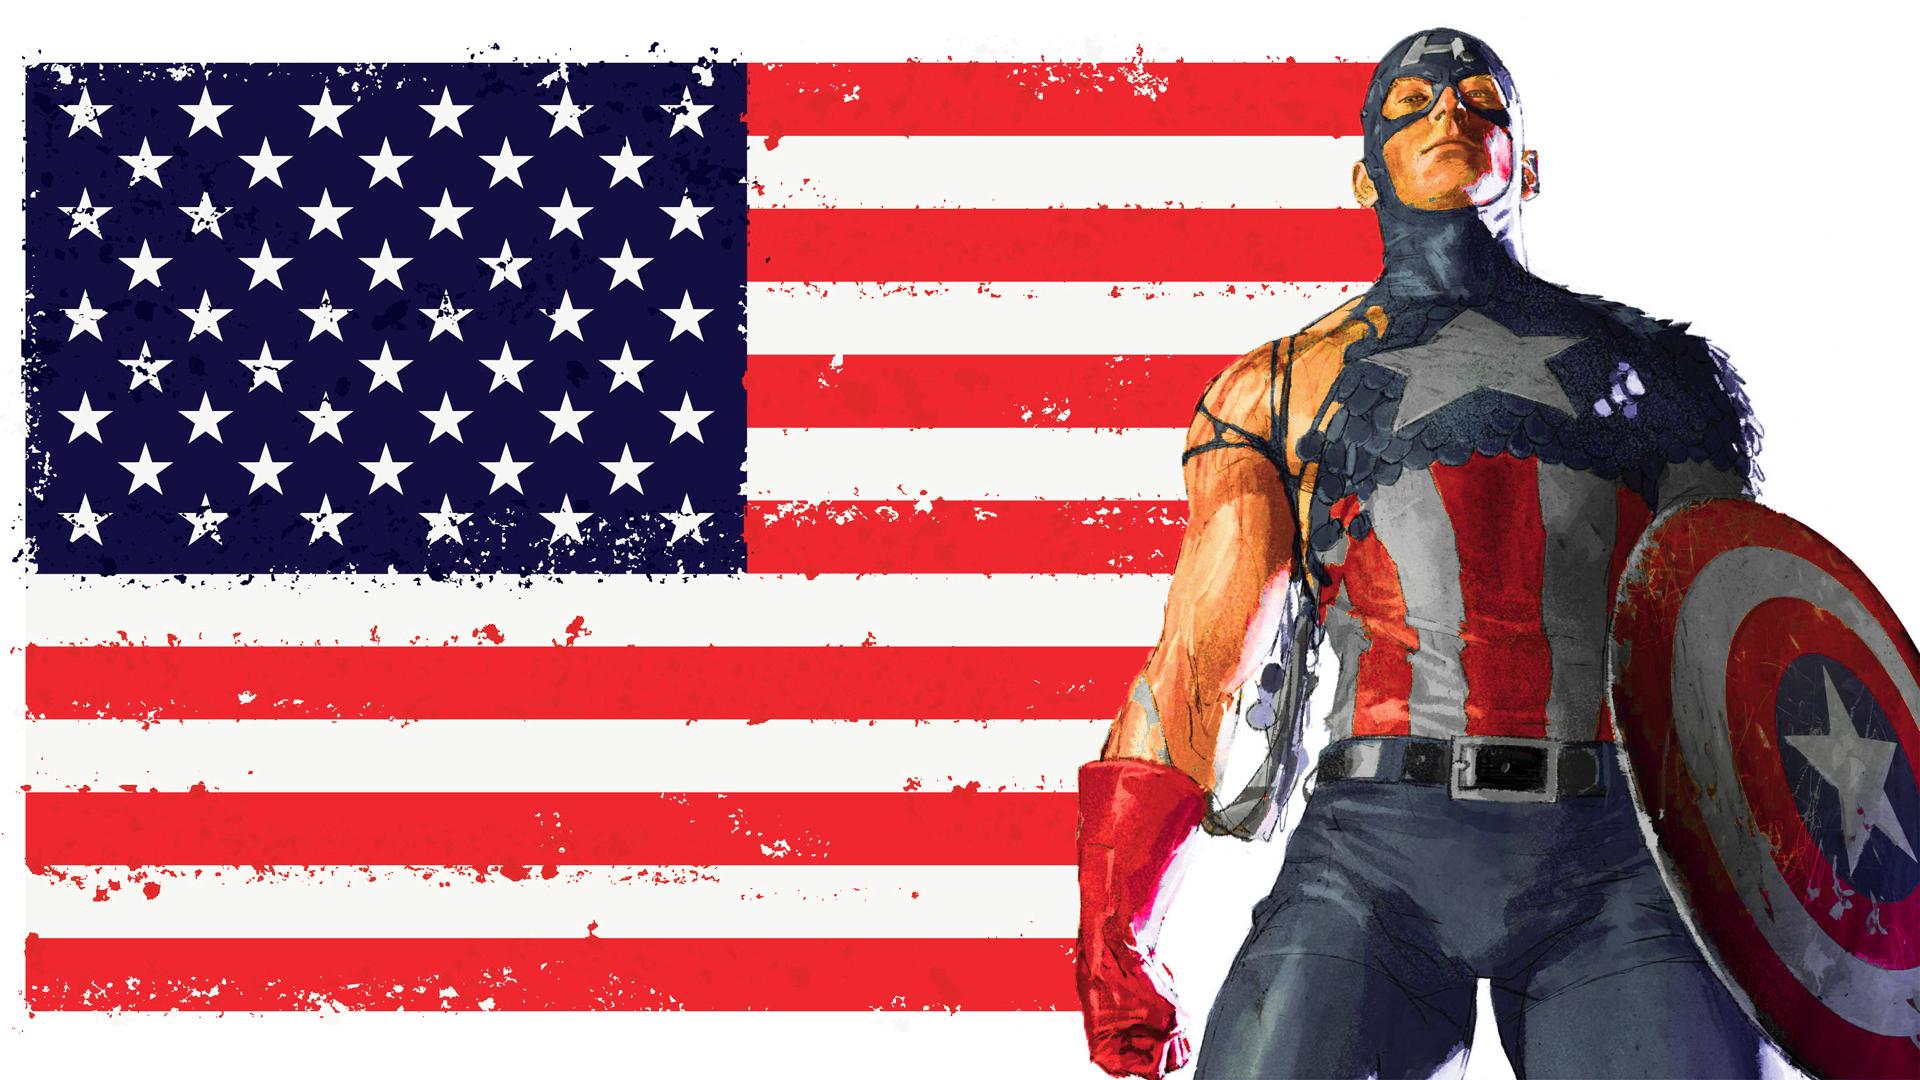 Hd Thanksgiving Wallpaper Free America Wallpaper Hd Pixelstalk Net